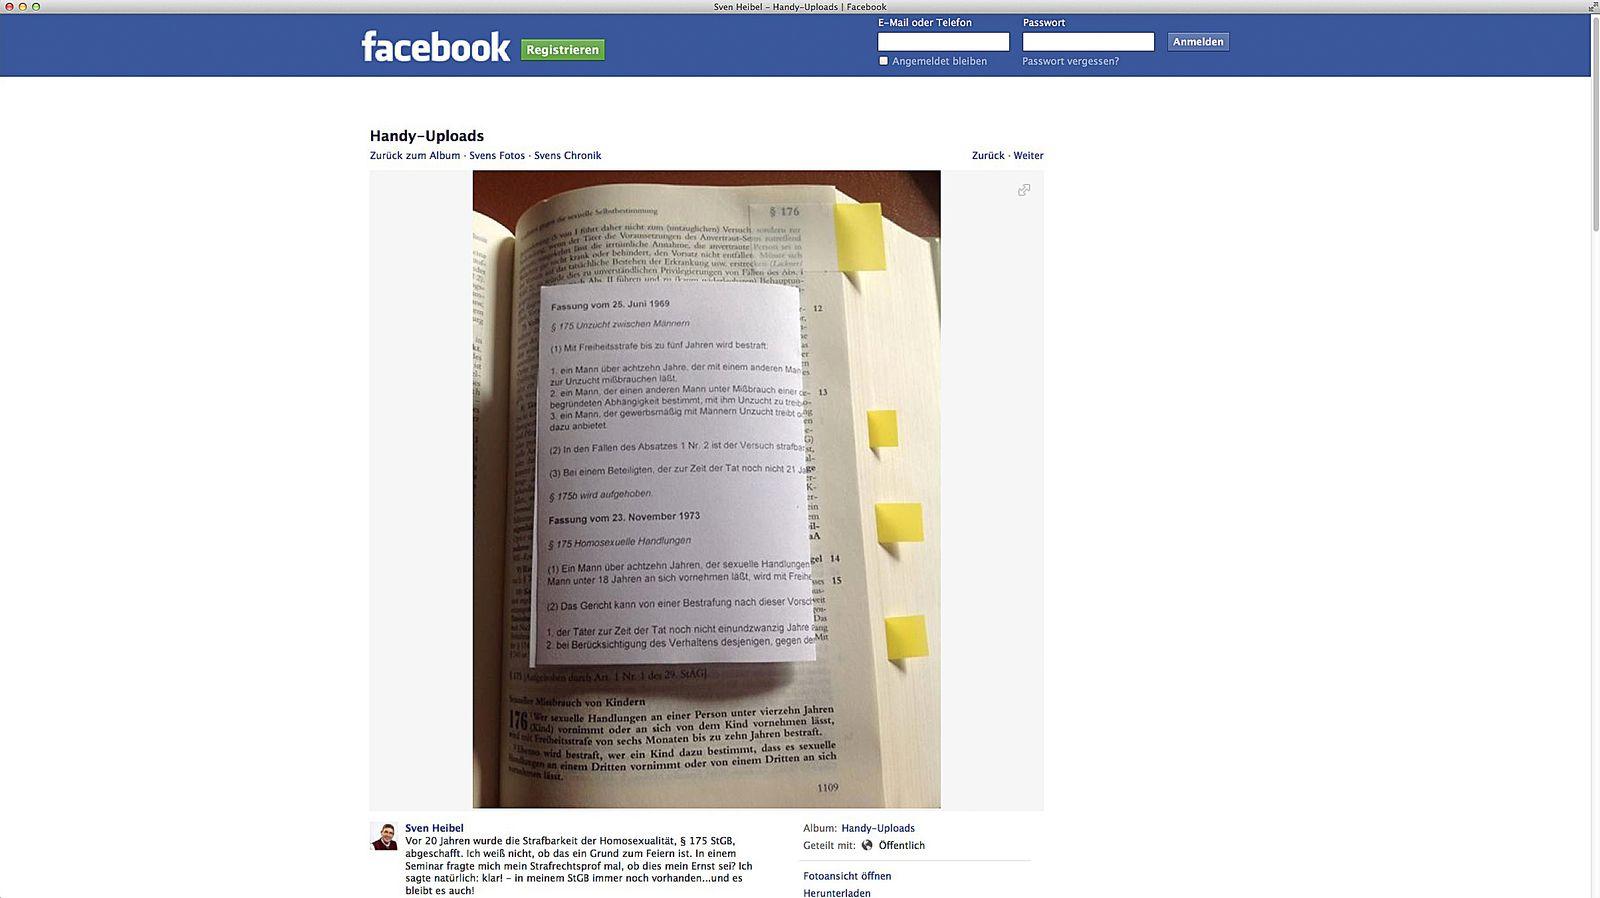 EINMALIGE VERWENDUNG NUR ALS ZITAT Screenshot/ Sven Heibel/ Facebook